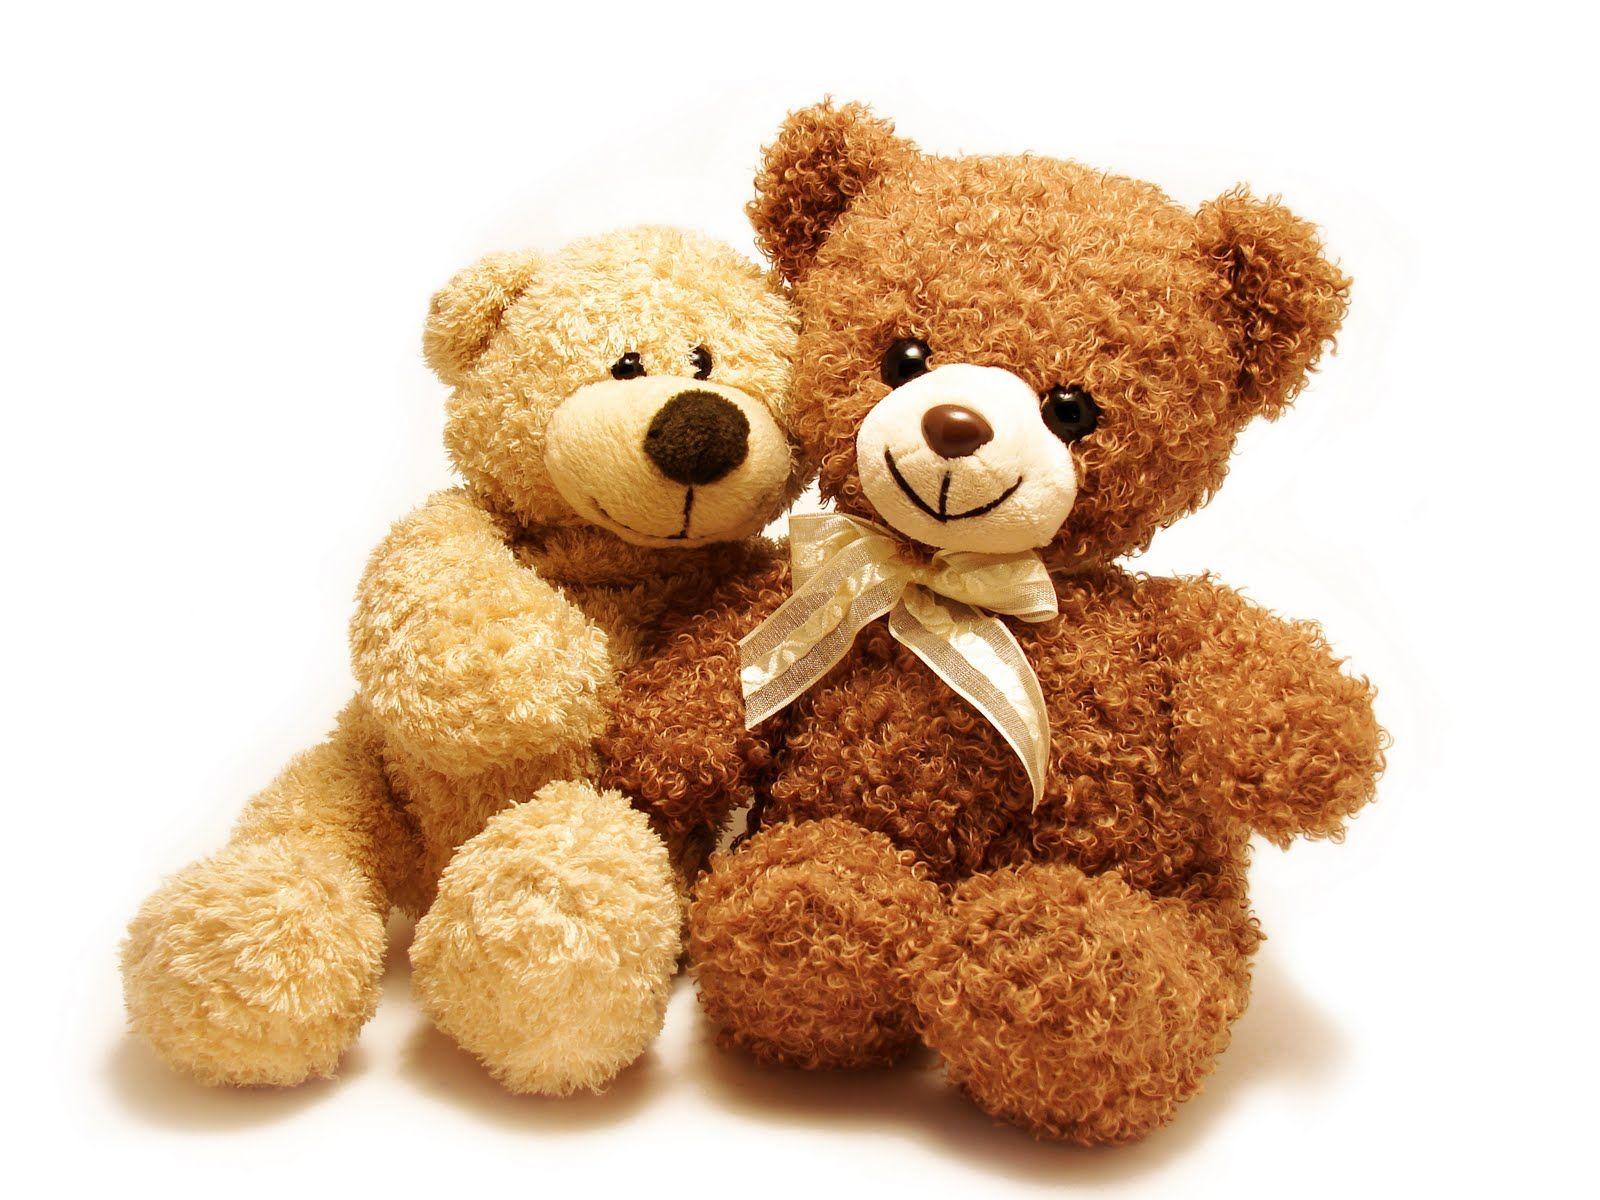 Sweet Teddy Couple Love Hd Photos Free Download 1080p Teddy Bear Day Happy Teddy Bear Day Teddy Bear Toys